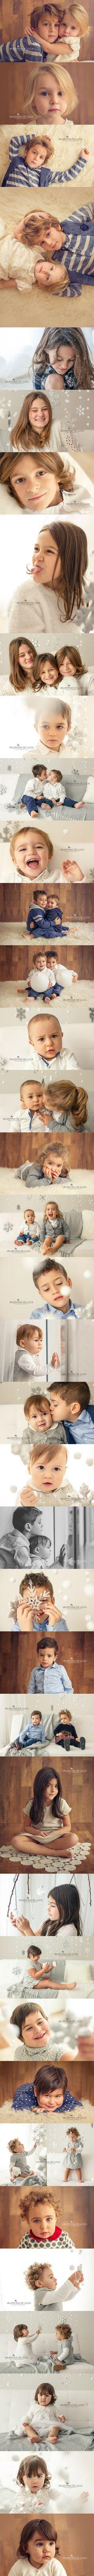 Mini sessioni Natale 2015  #christmasminis #mininatale #sessione #natale #child #photography #children #bambini #christmas #minisession #shoot #baby #famiglie #fotografo #teramo #studiofotografico #stampaletuefoto #fineart #pescara #sanbenedettodeltronto #ancona #ascolipiceno